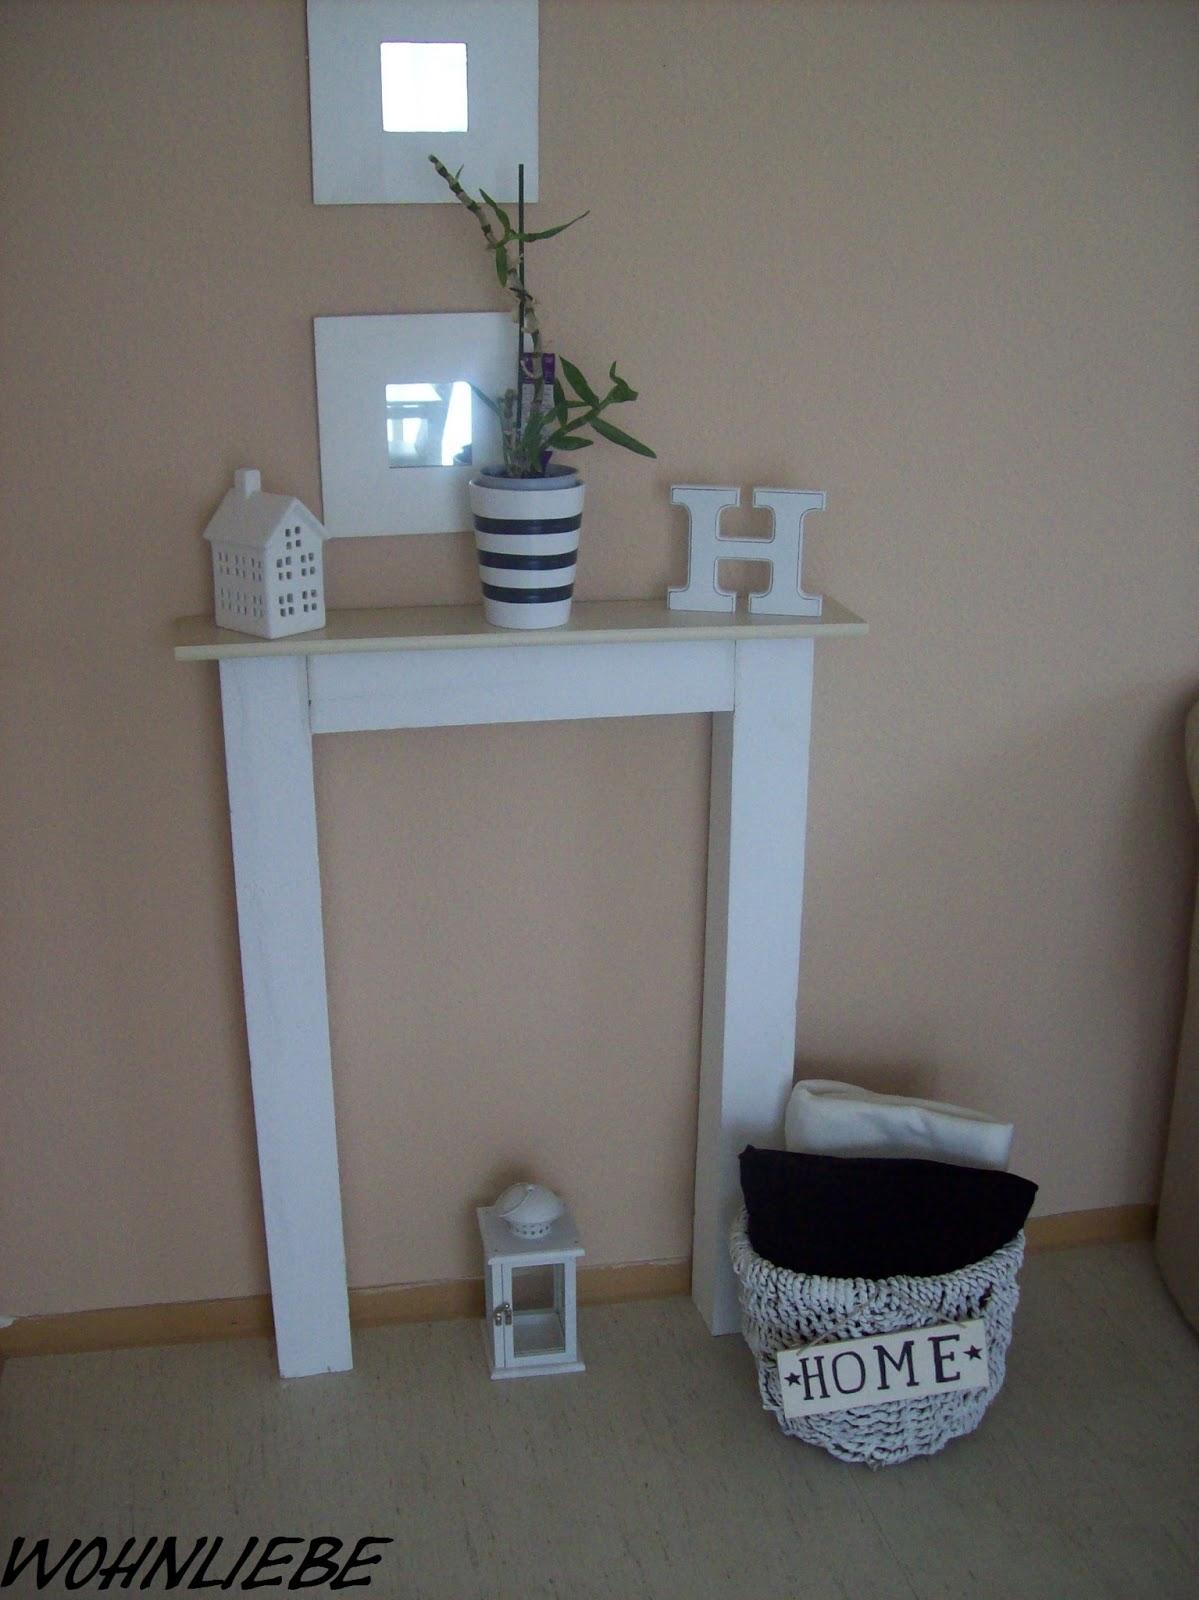 wohnliebe selbstgebaute deko kaminumrandung. Black Bedroom Furniture Sets. Home Design Ideas